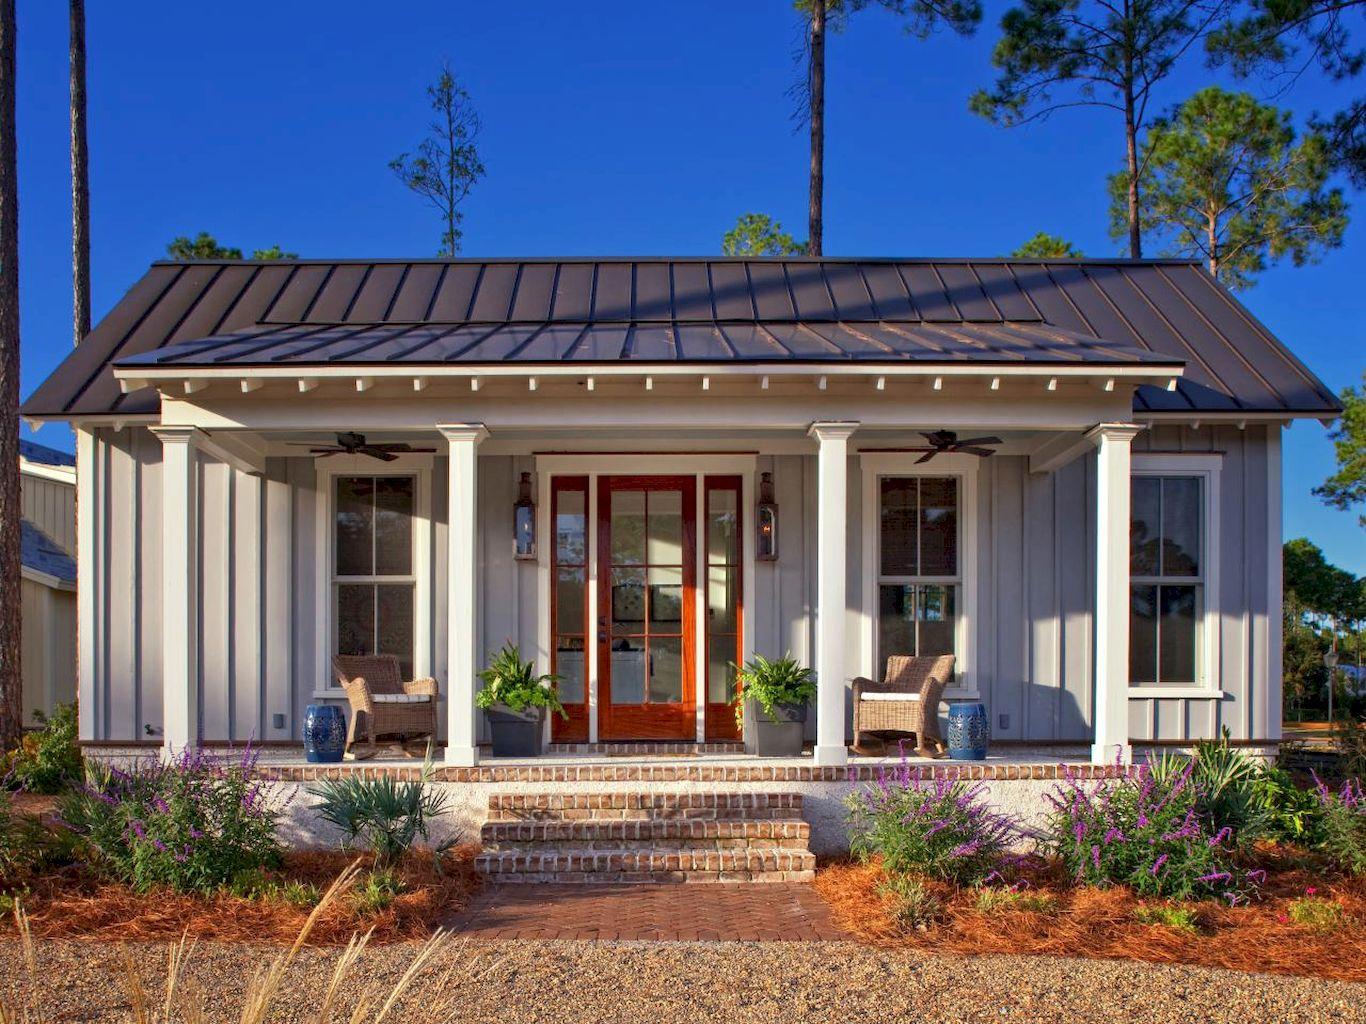 60 amazing farmhouse plans cracker style design ideas (1)